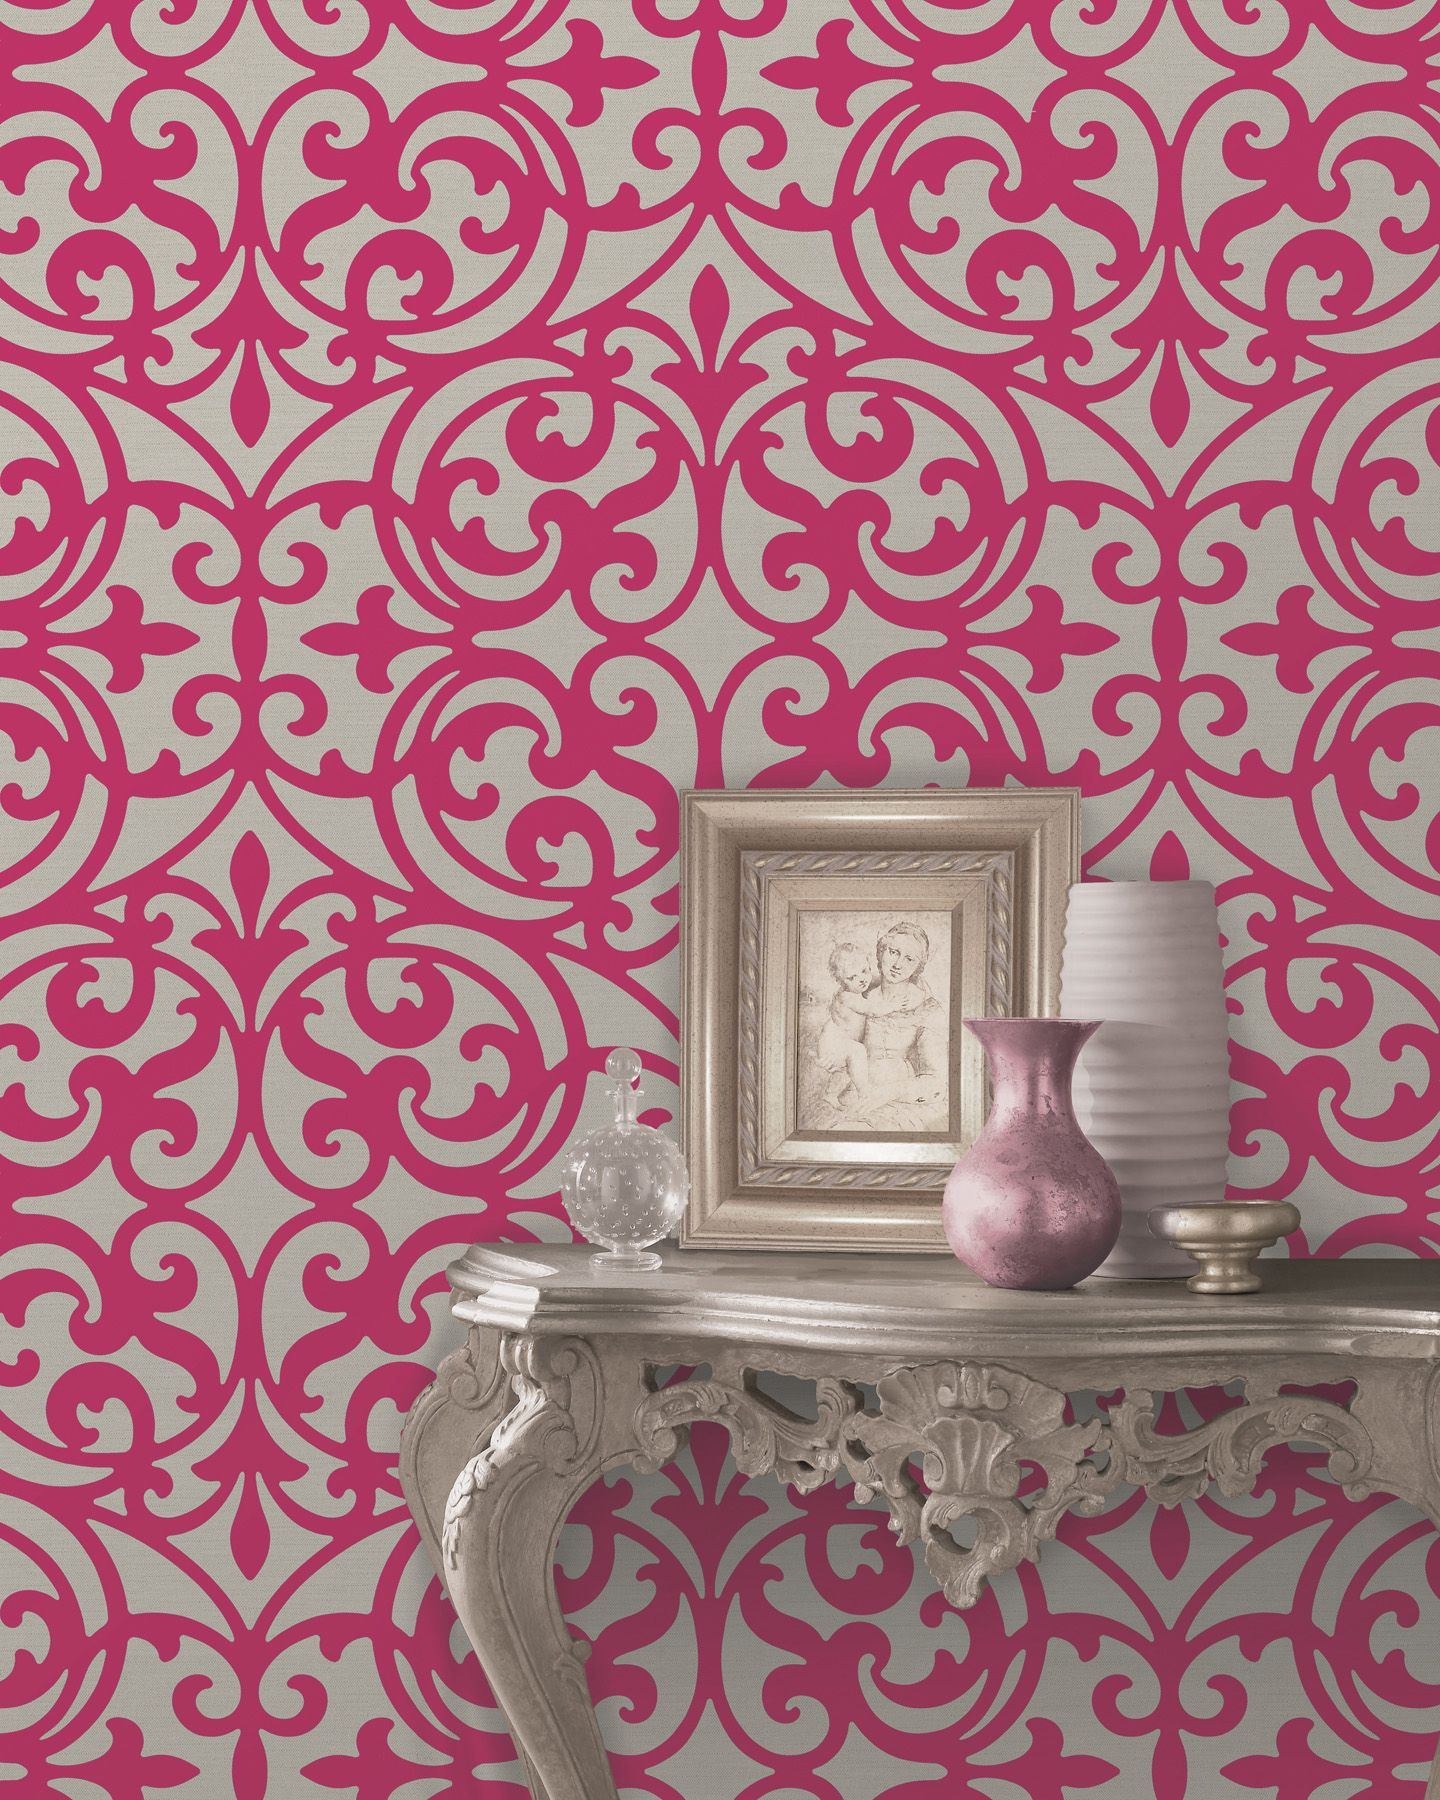 pink wallpaper feature wall global chic modern decor